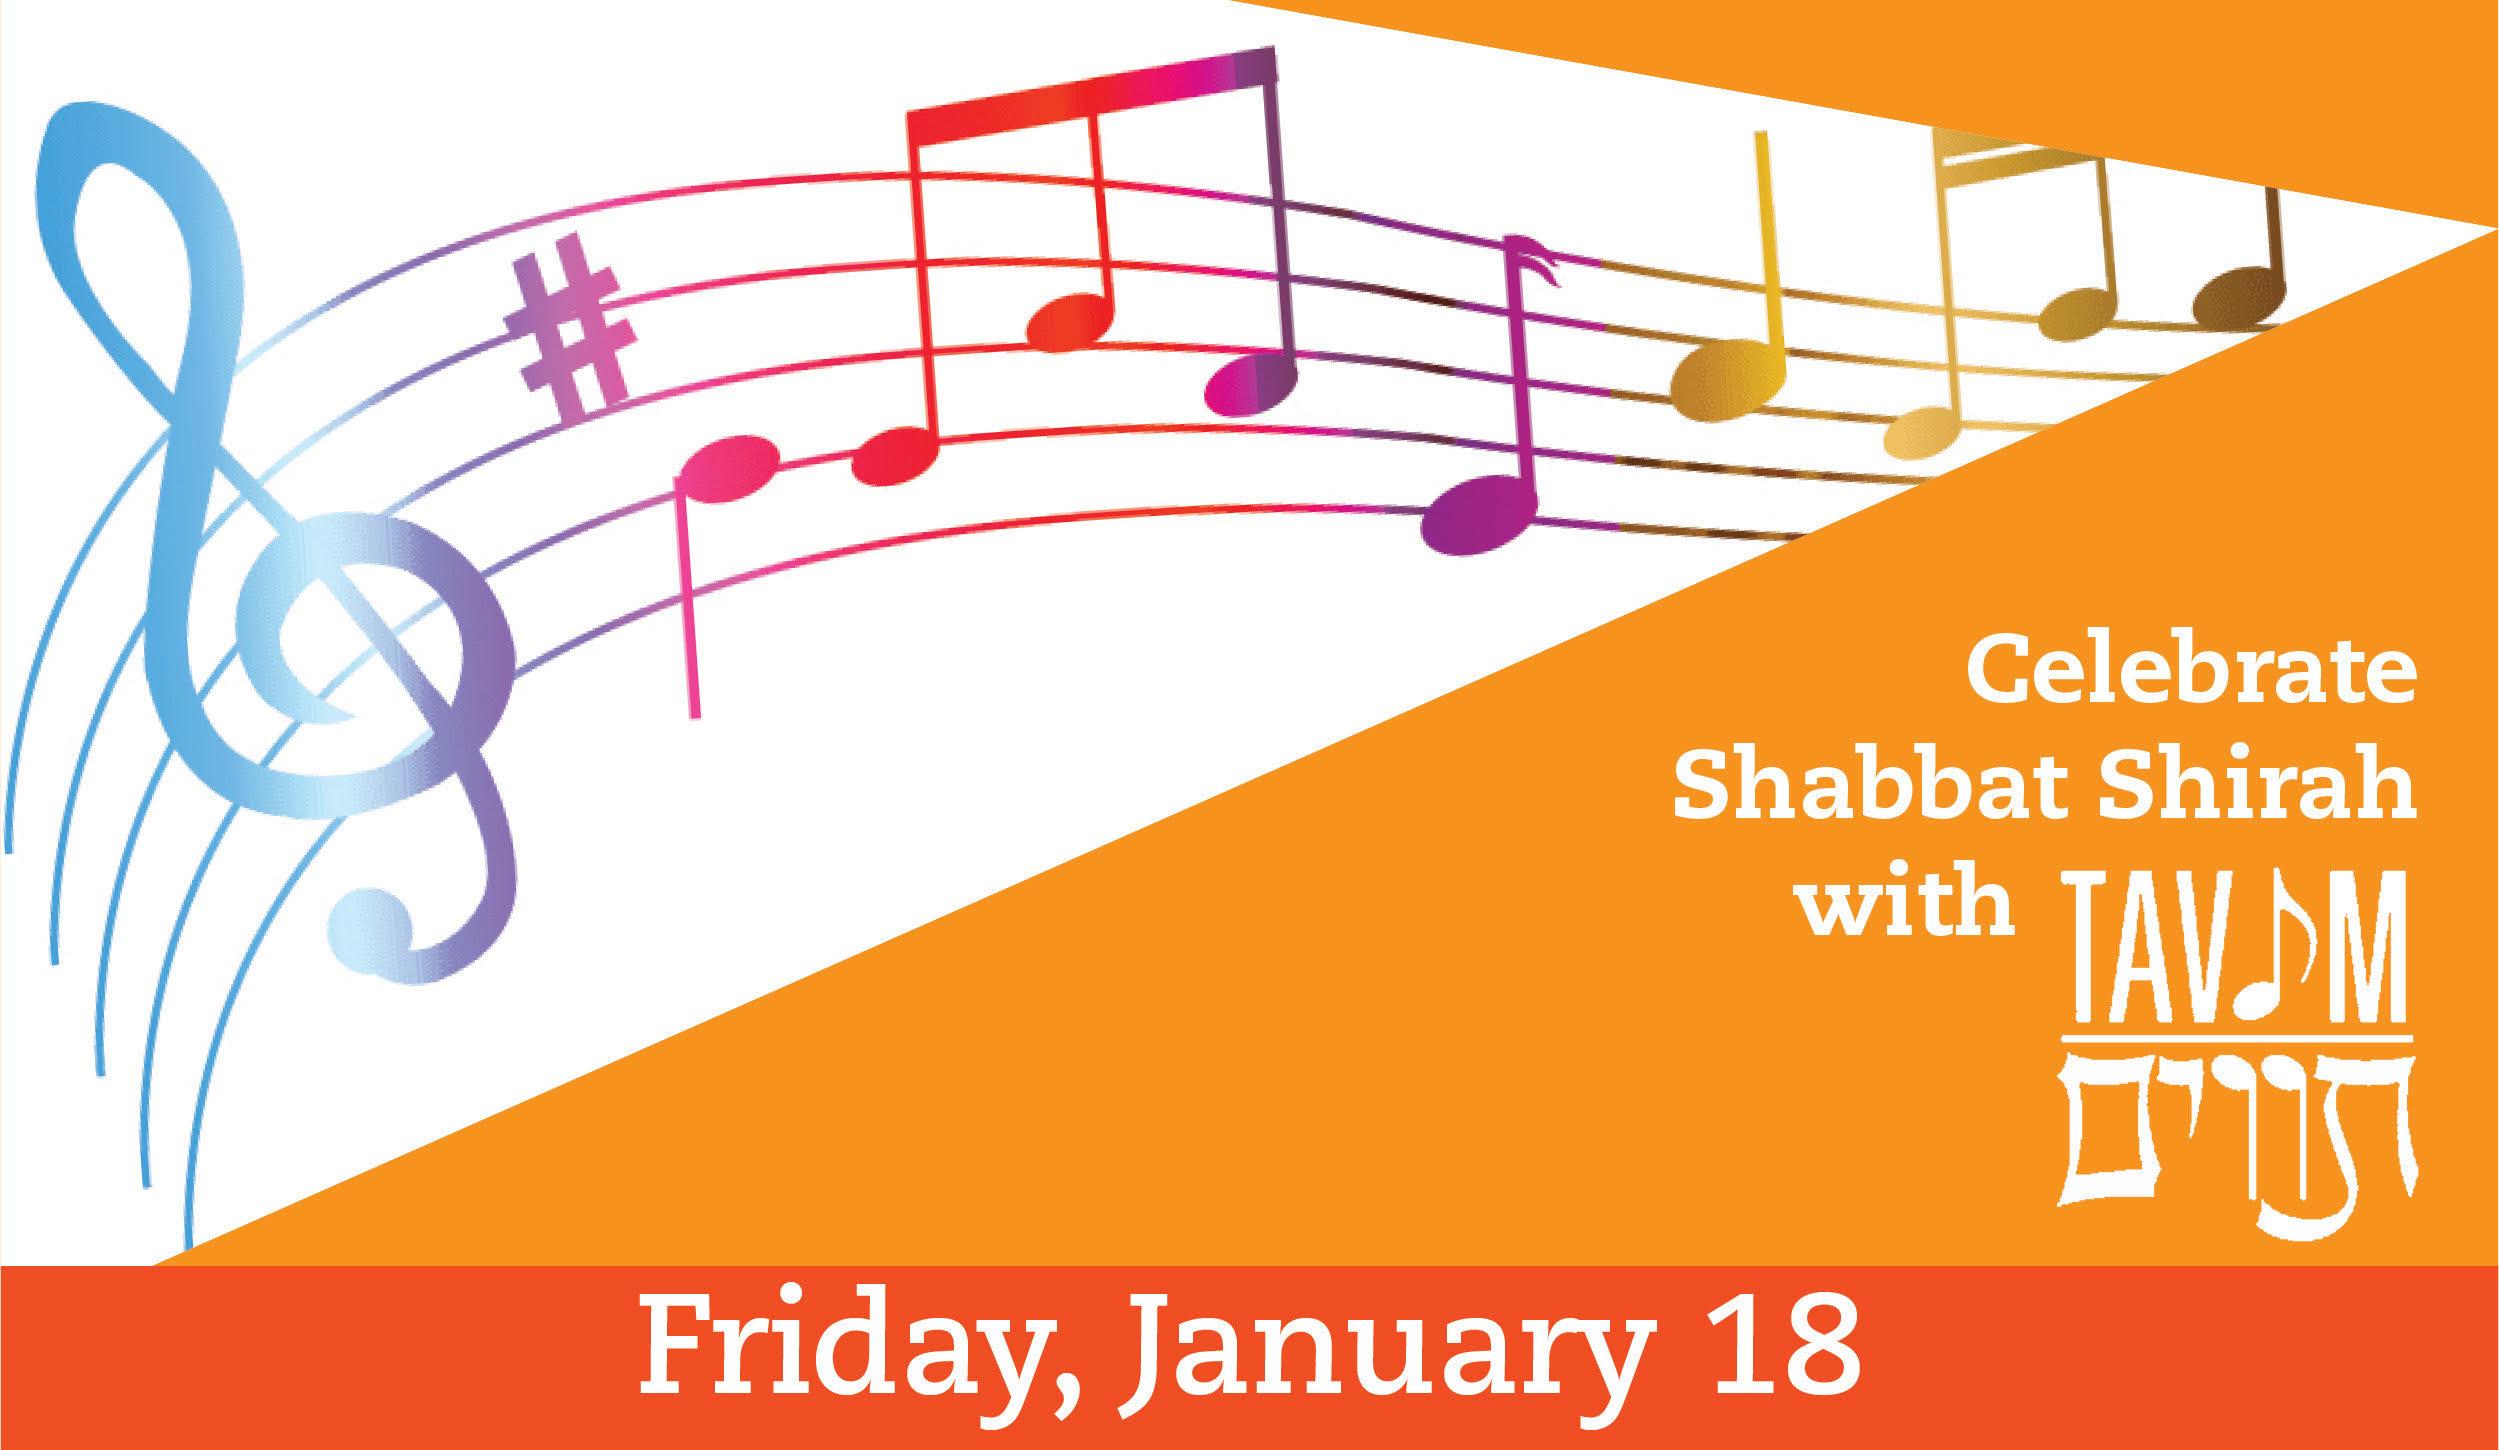 "<a href=""https://www.cbsteaneck.org/event/sisterhood/ruach---shabbat-shirah-dinner-.html#""                                     target="""">                                                                 <span class=""slider_title"">                                     Shabbat Shira with TAVIM                                </span>                                                                 </a>                                                                                                                                                                                       <span class=""slider_description"">Friday night dinner sponsored by Sisterhood and Ruach Committee</span>"